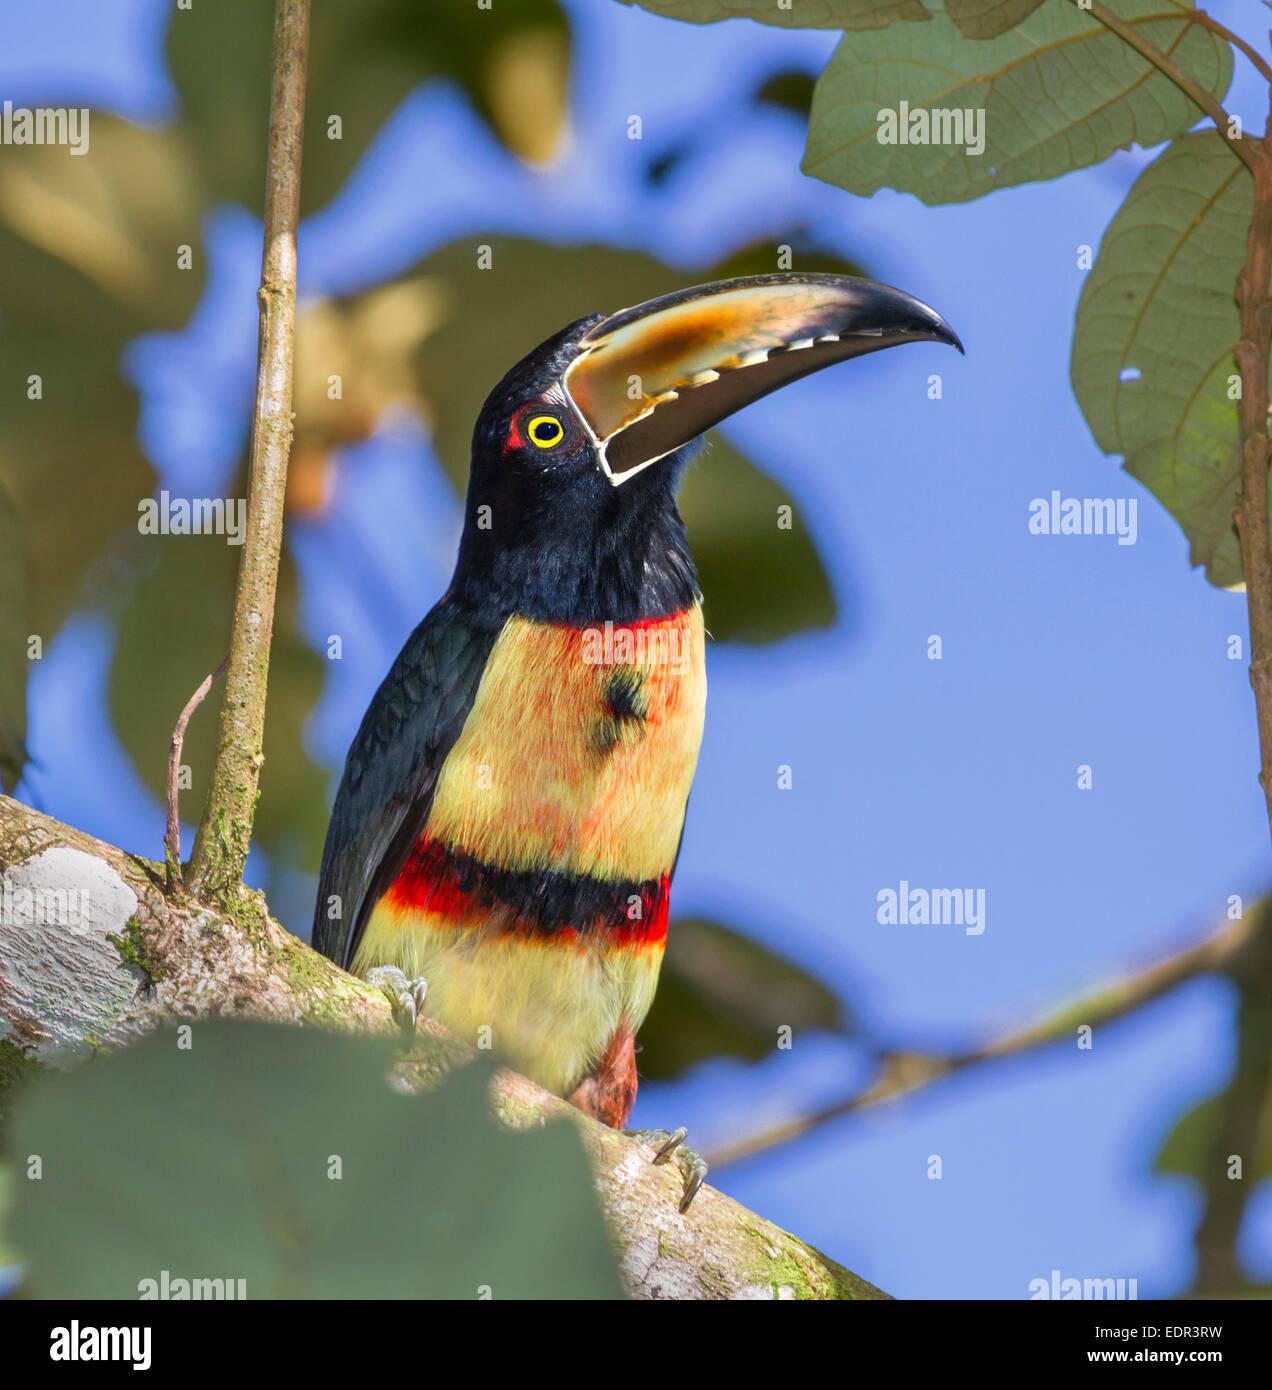 Crouched collared aracari (Pteroglossus torquatus) portrait, Tortuguero, Costa Rica. Stock Photo